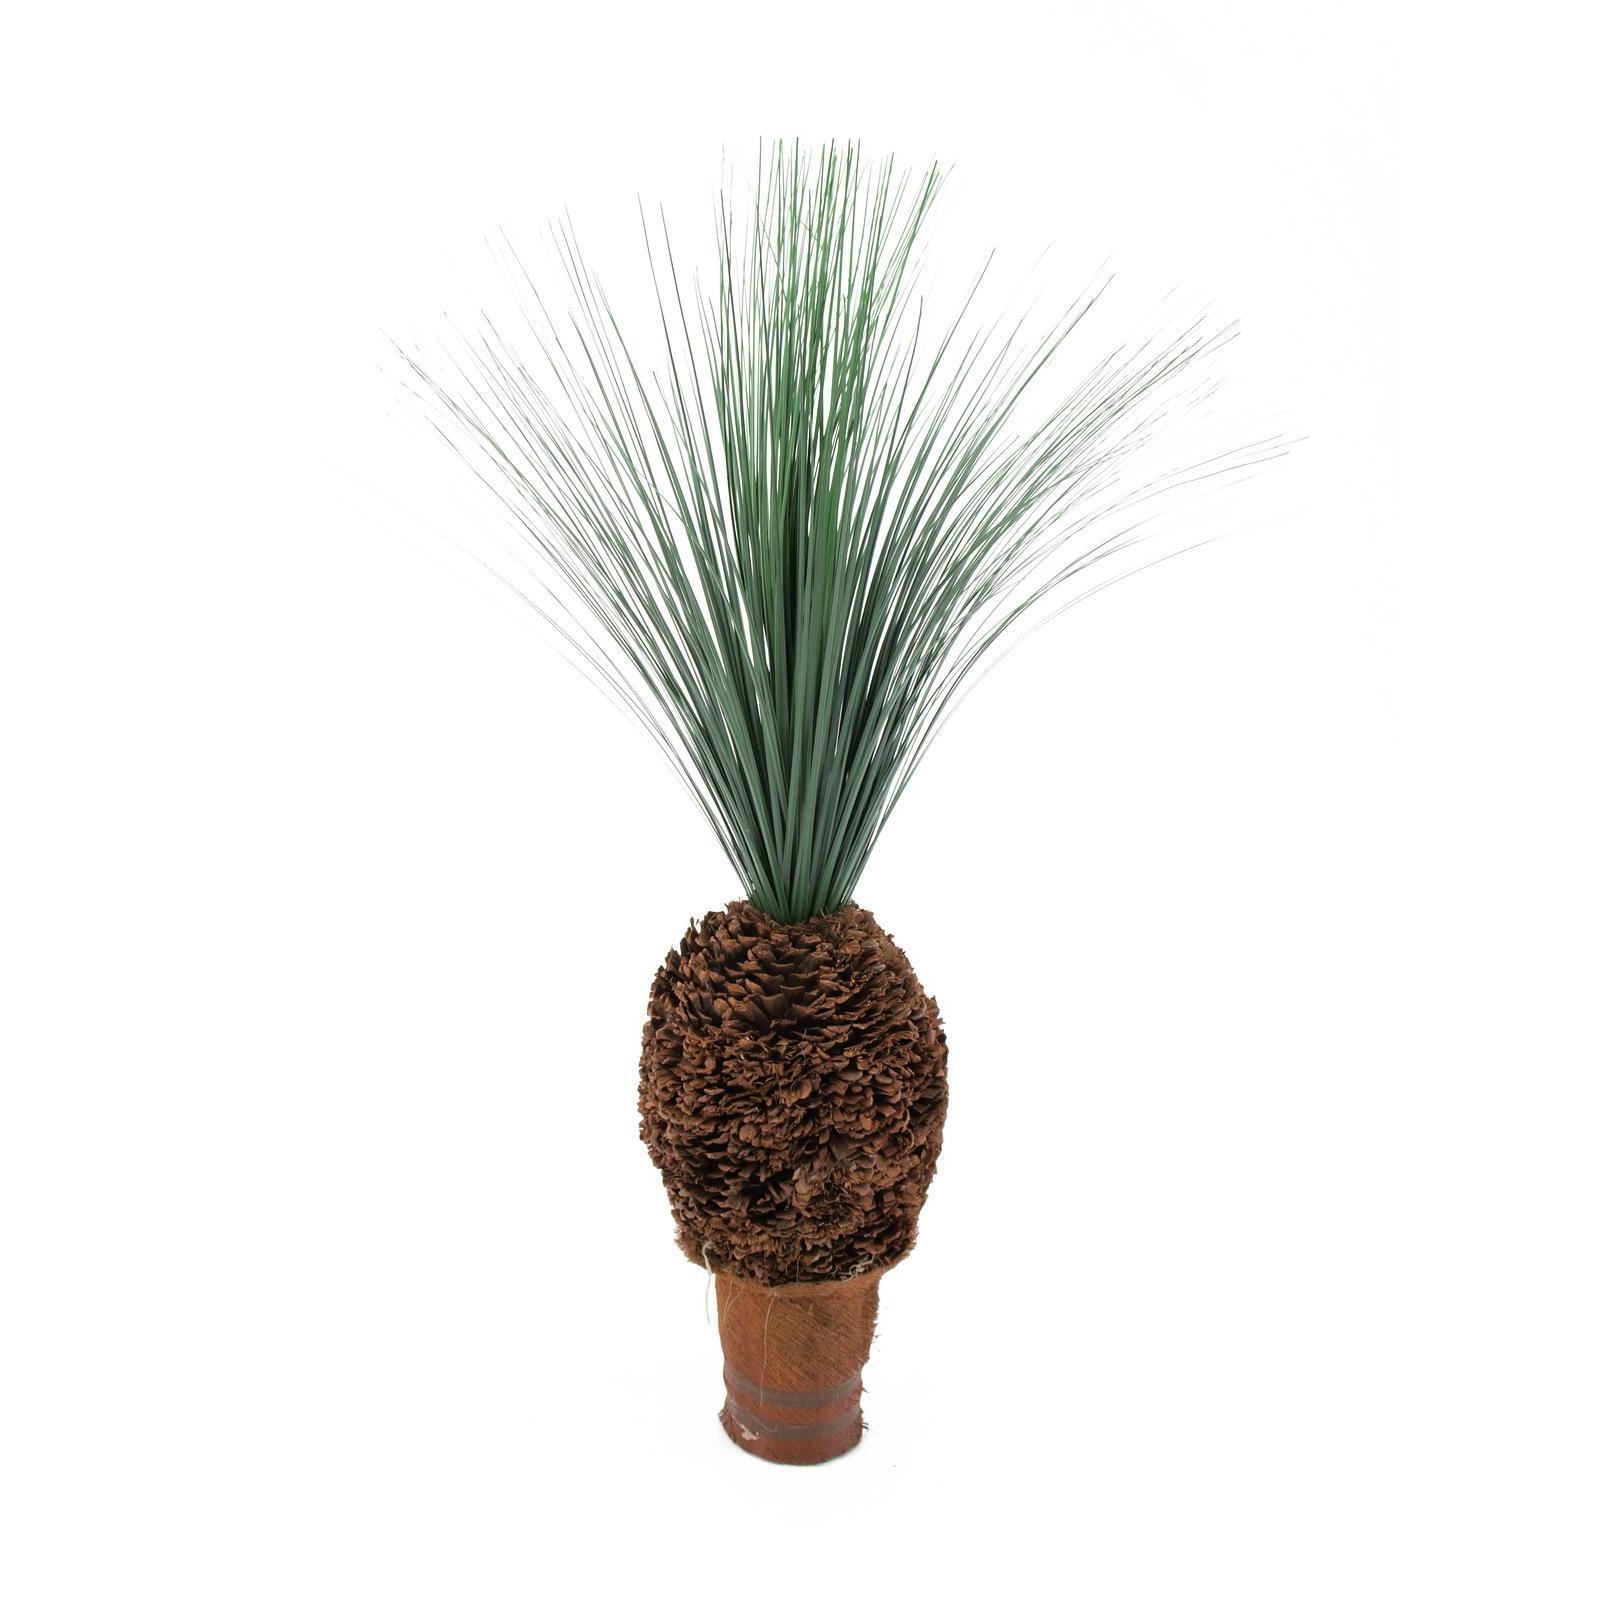 EUROPALMS Rain grass palm with nodule trunk, 90cm